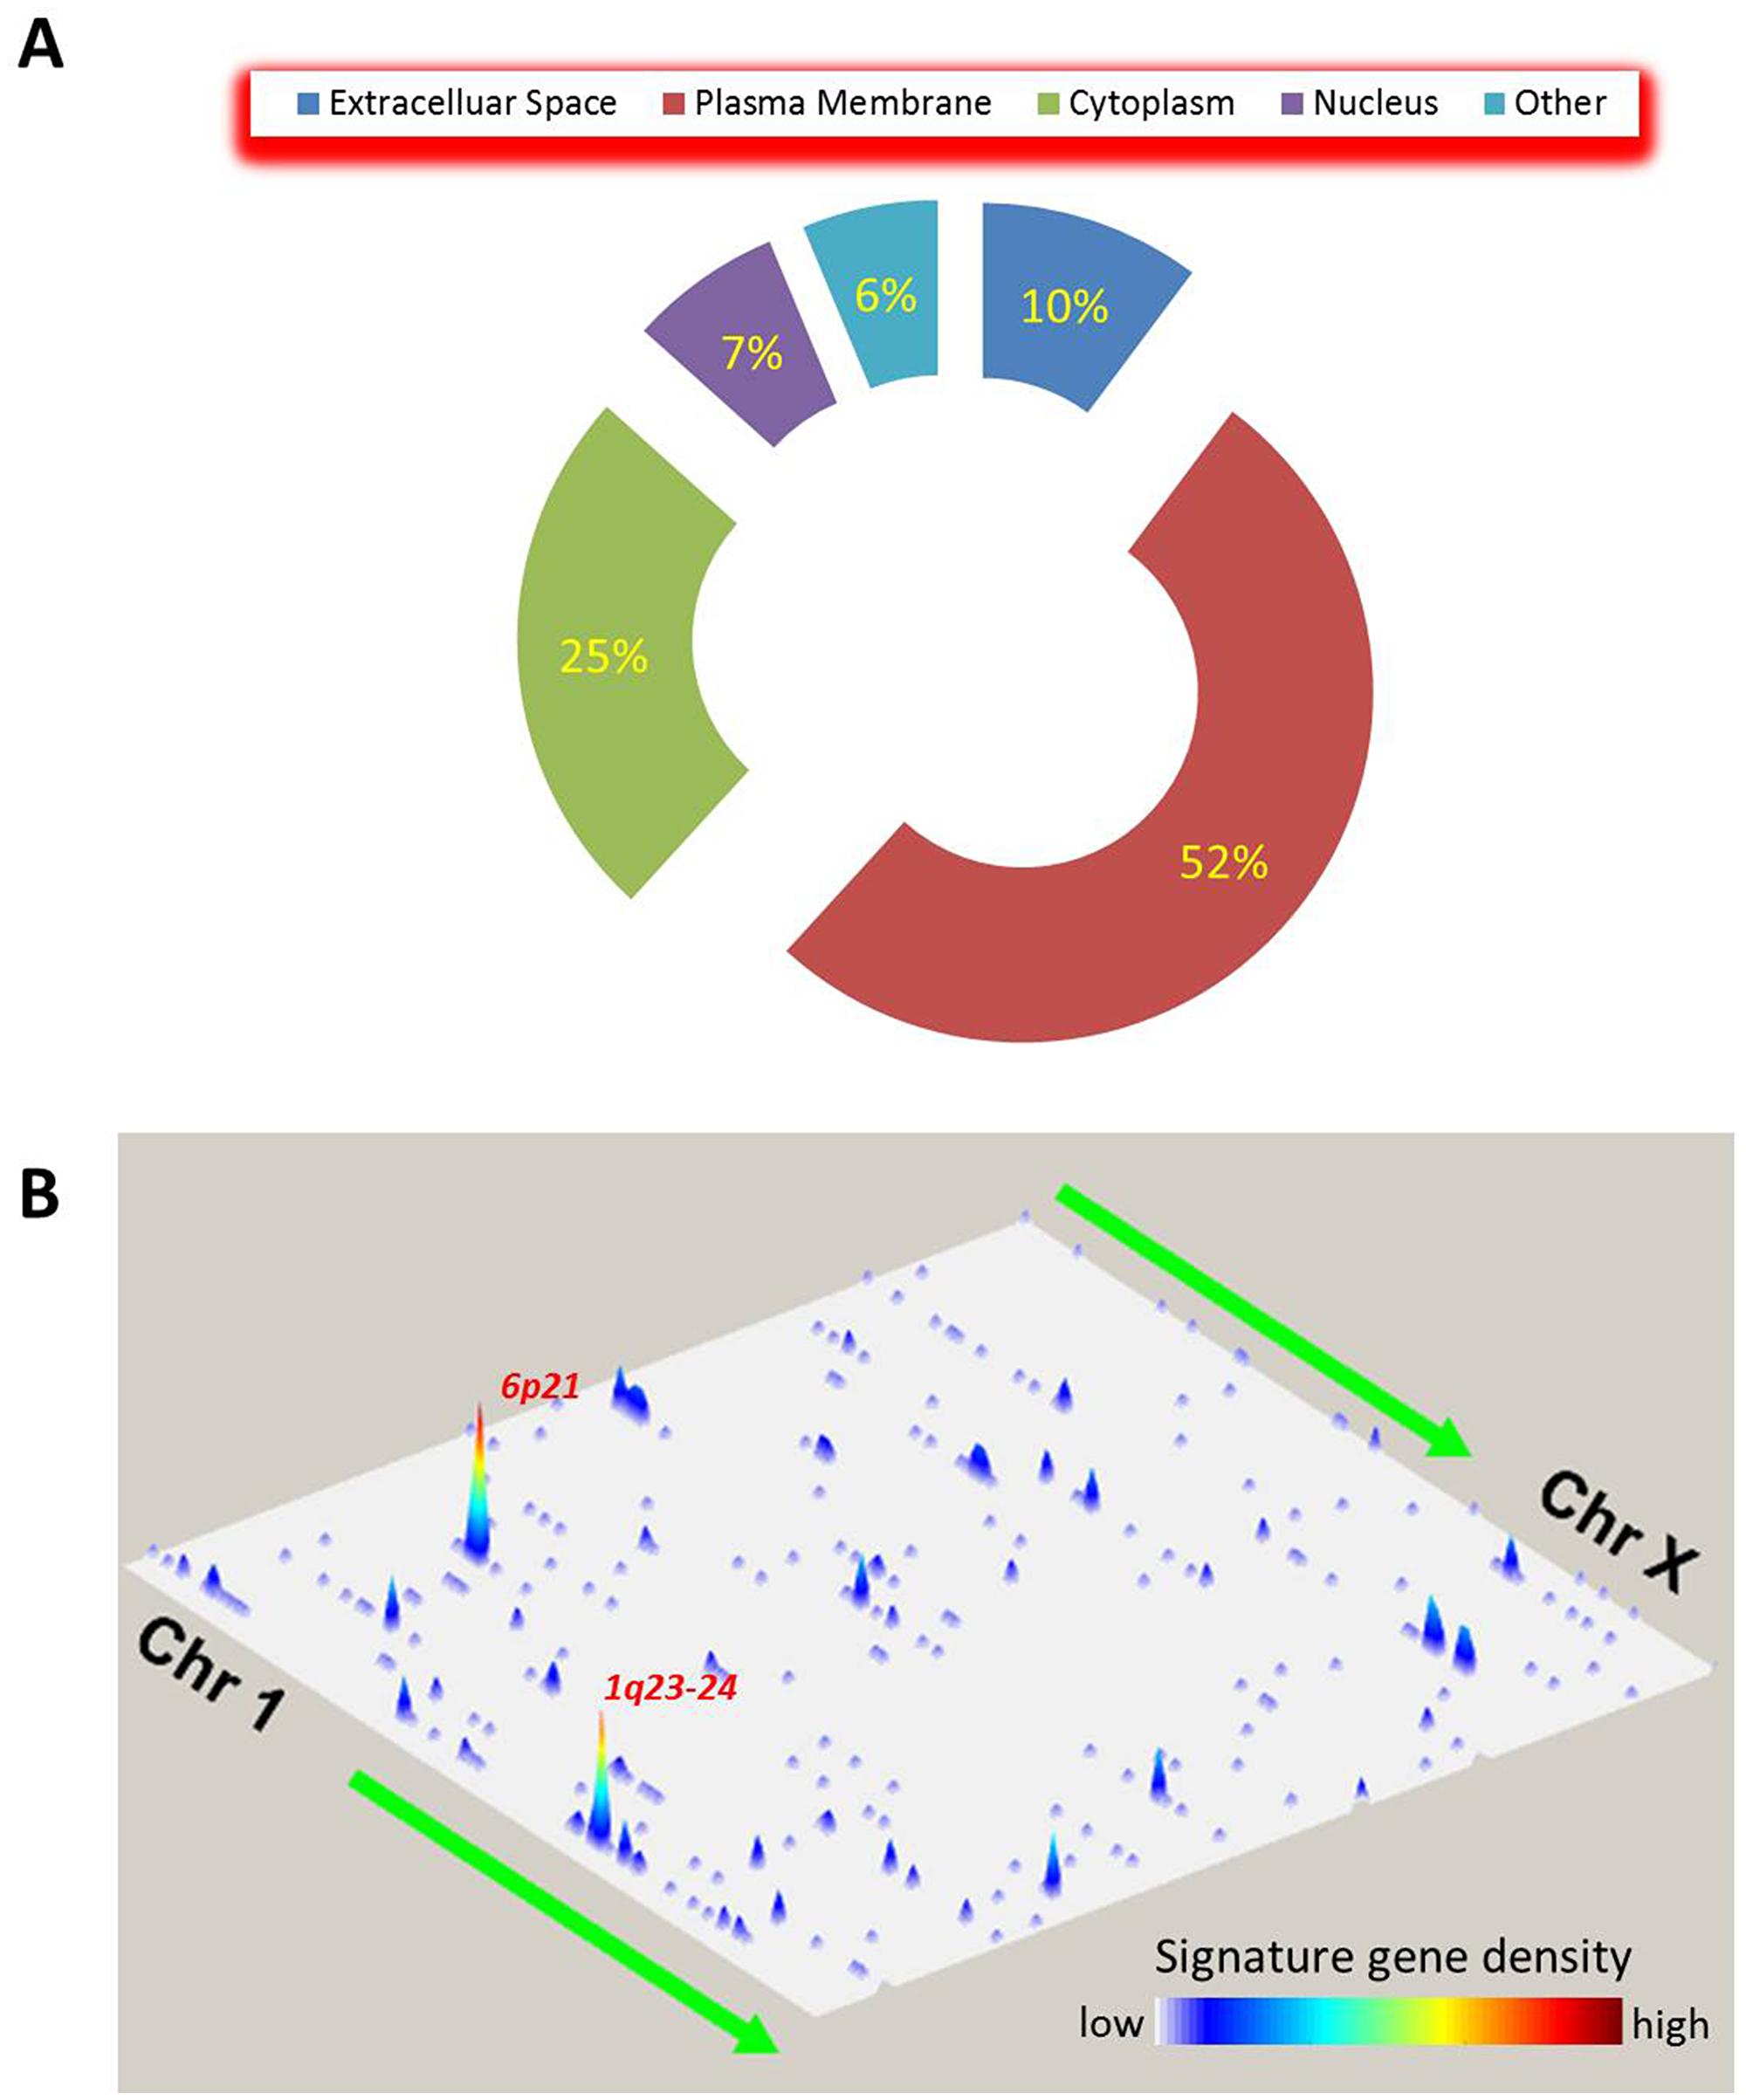 Spatial characteristics of the global immune gene signature.